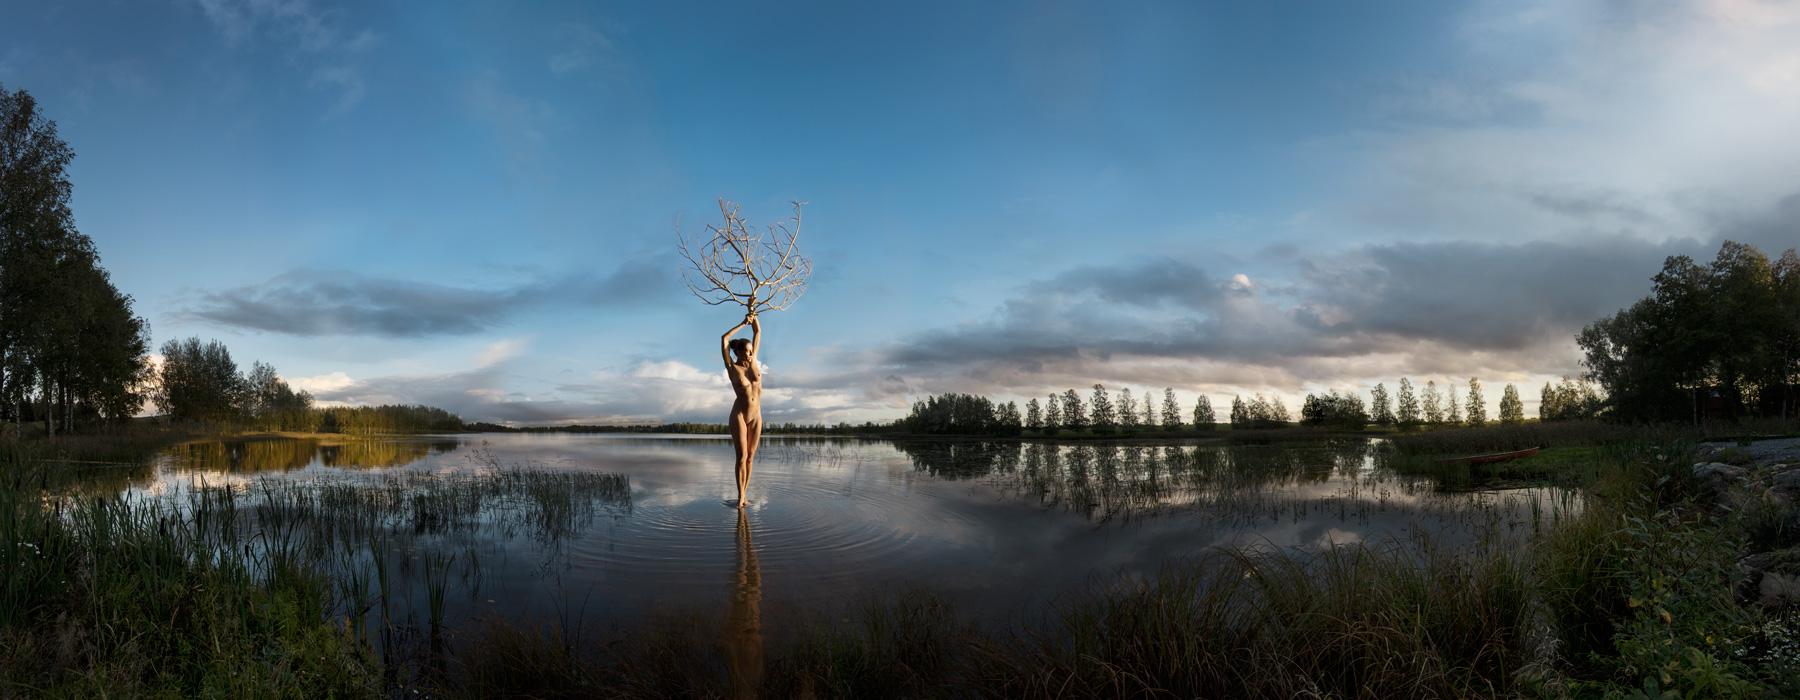 KÄÄNNA JUURI XII. Fotografía y retoque digital. Lago Heinijarvi, Hämeenkyrö, Finlandia